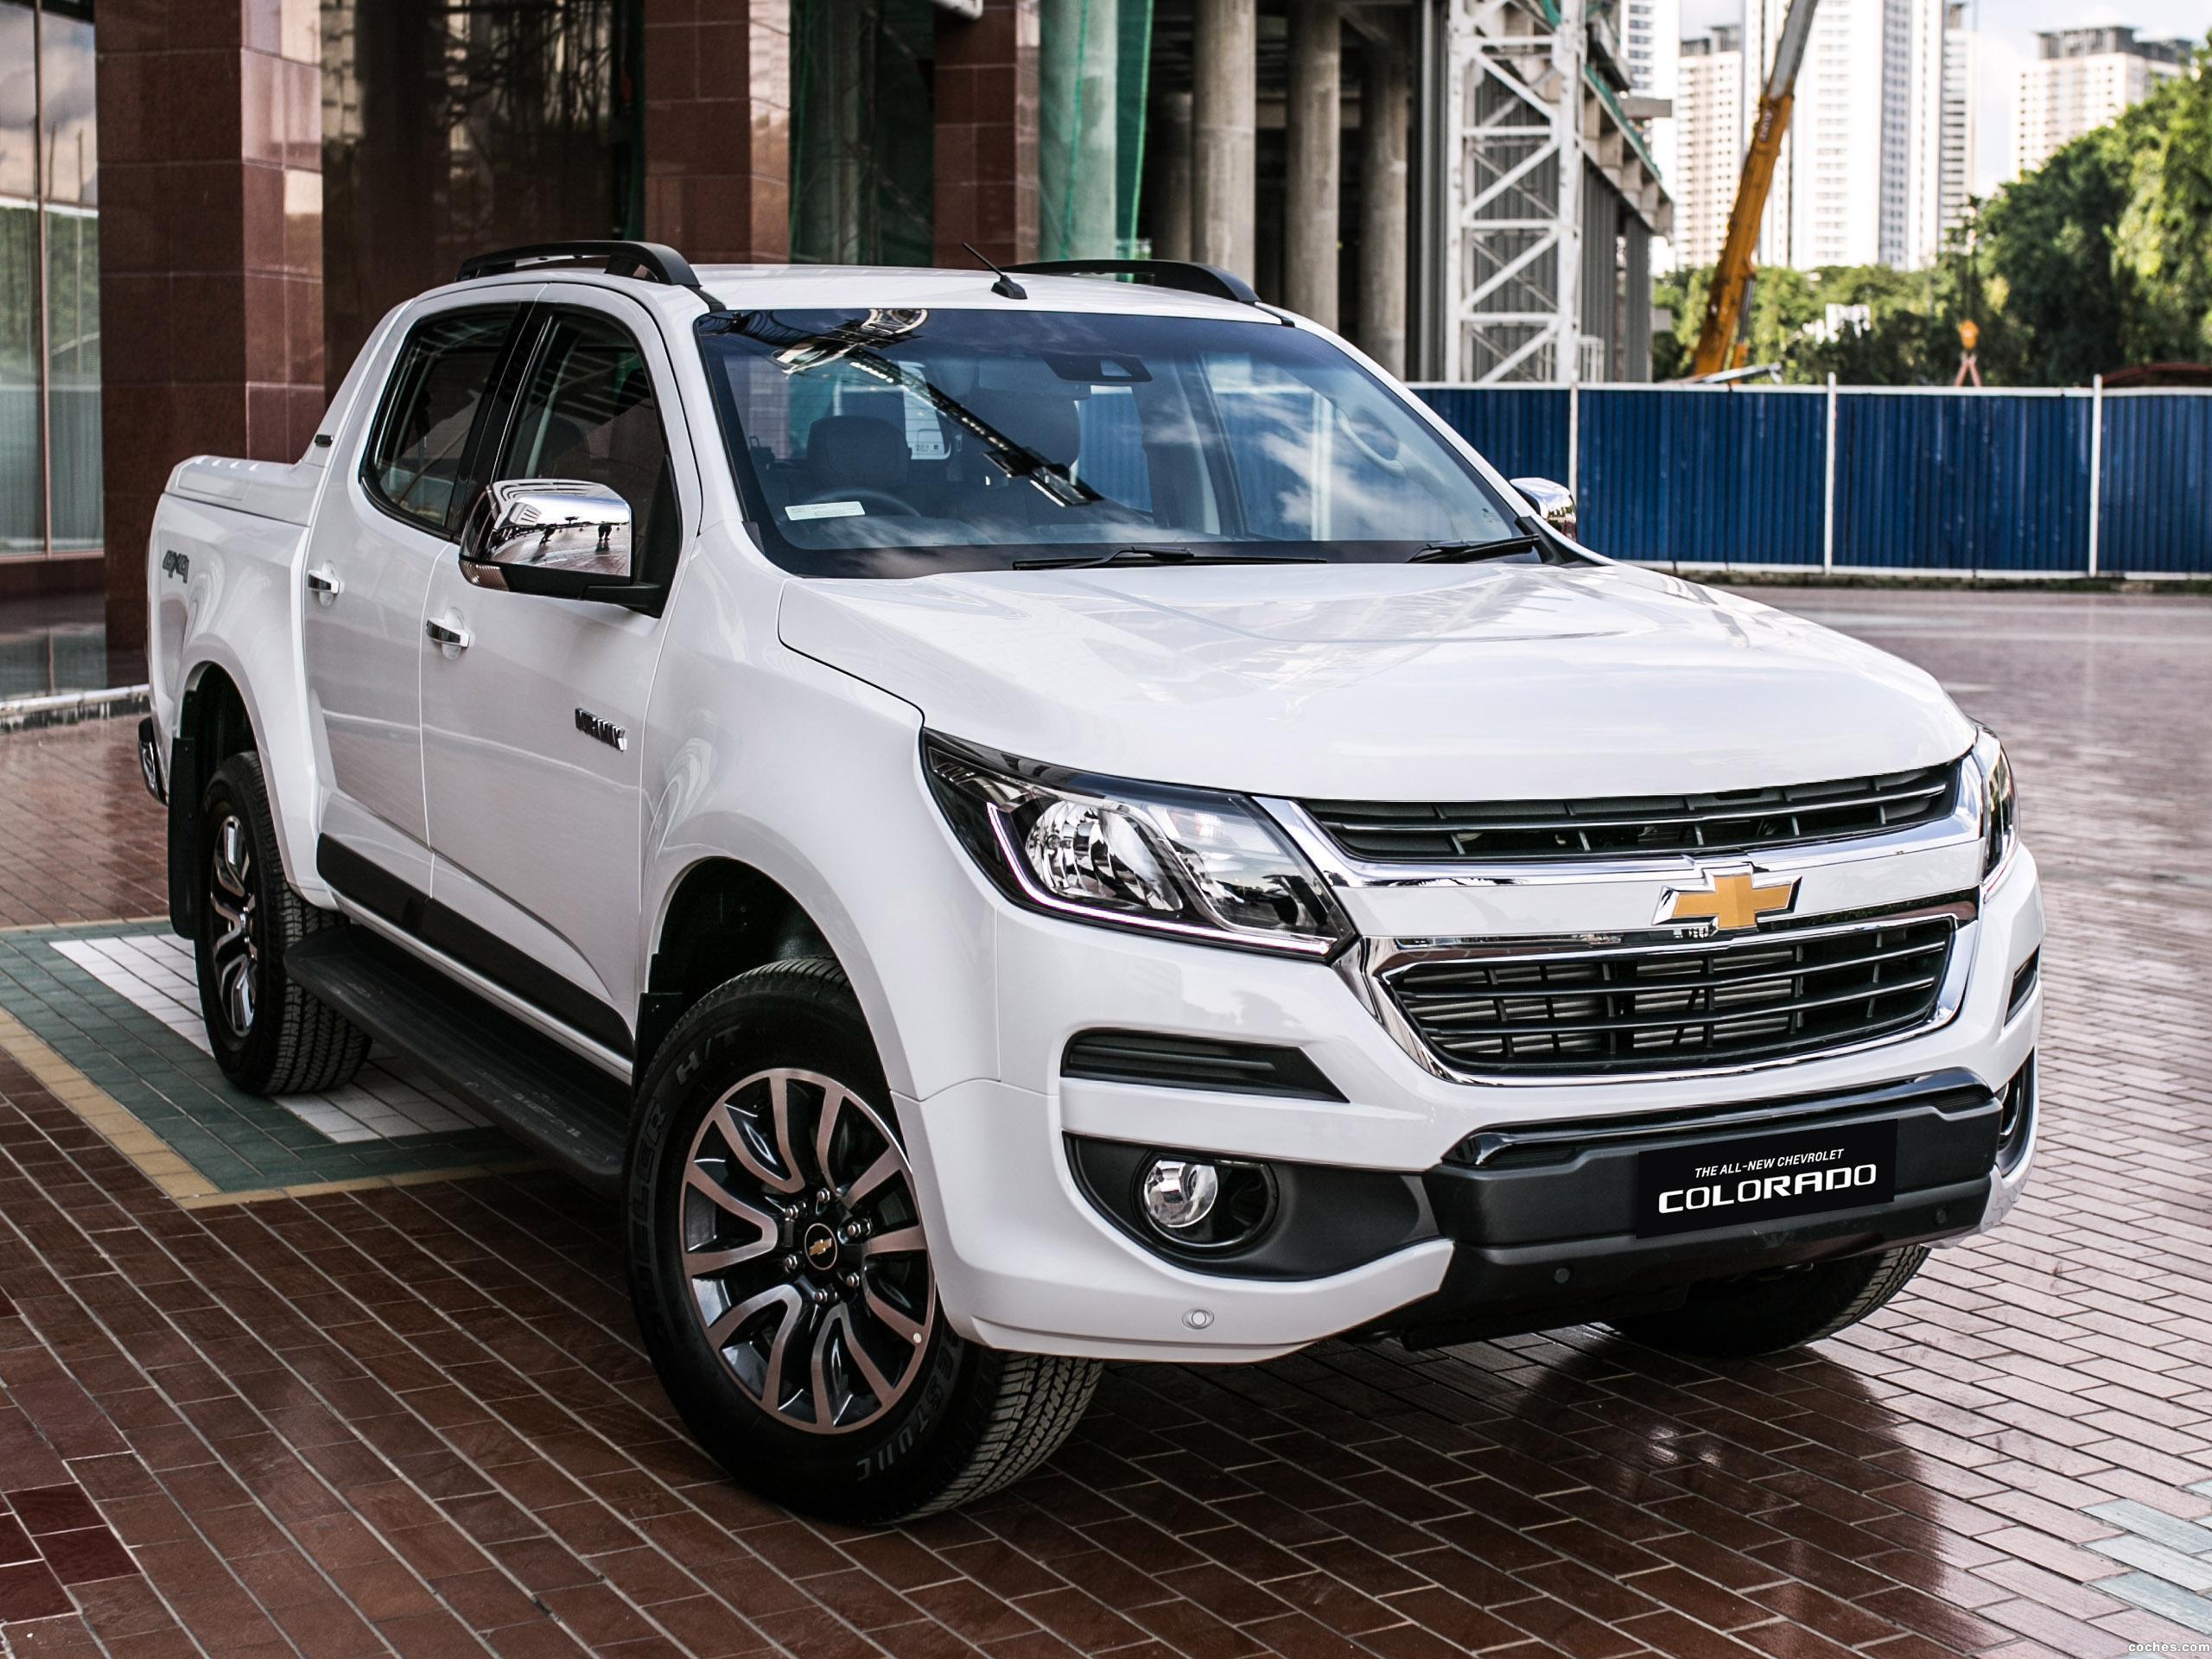 Foto 0 de Chevrolet Colorado High Country India 2017